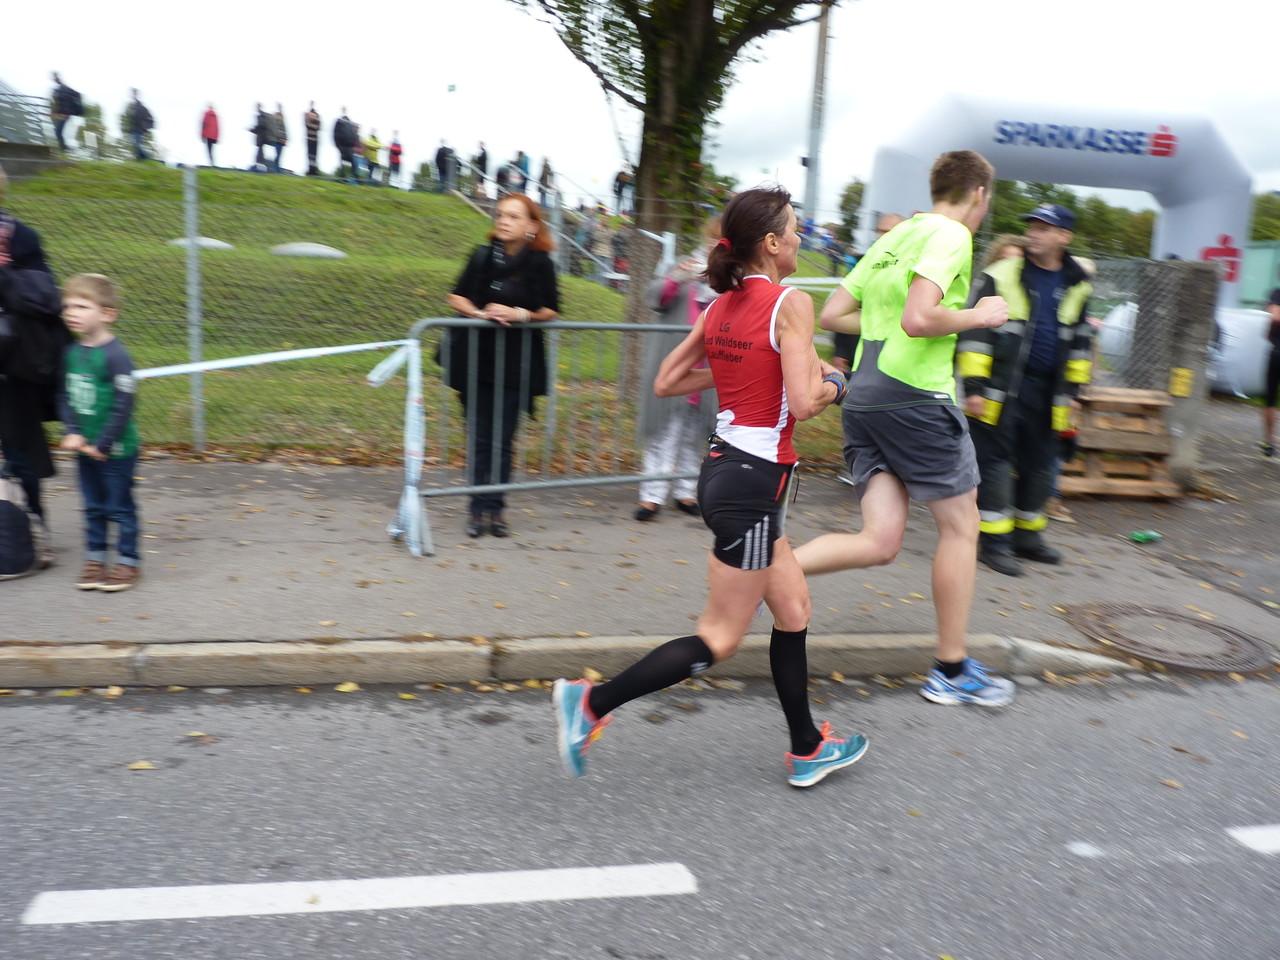 Heidi - Halbmarathon in 1:43:24